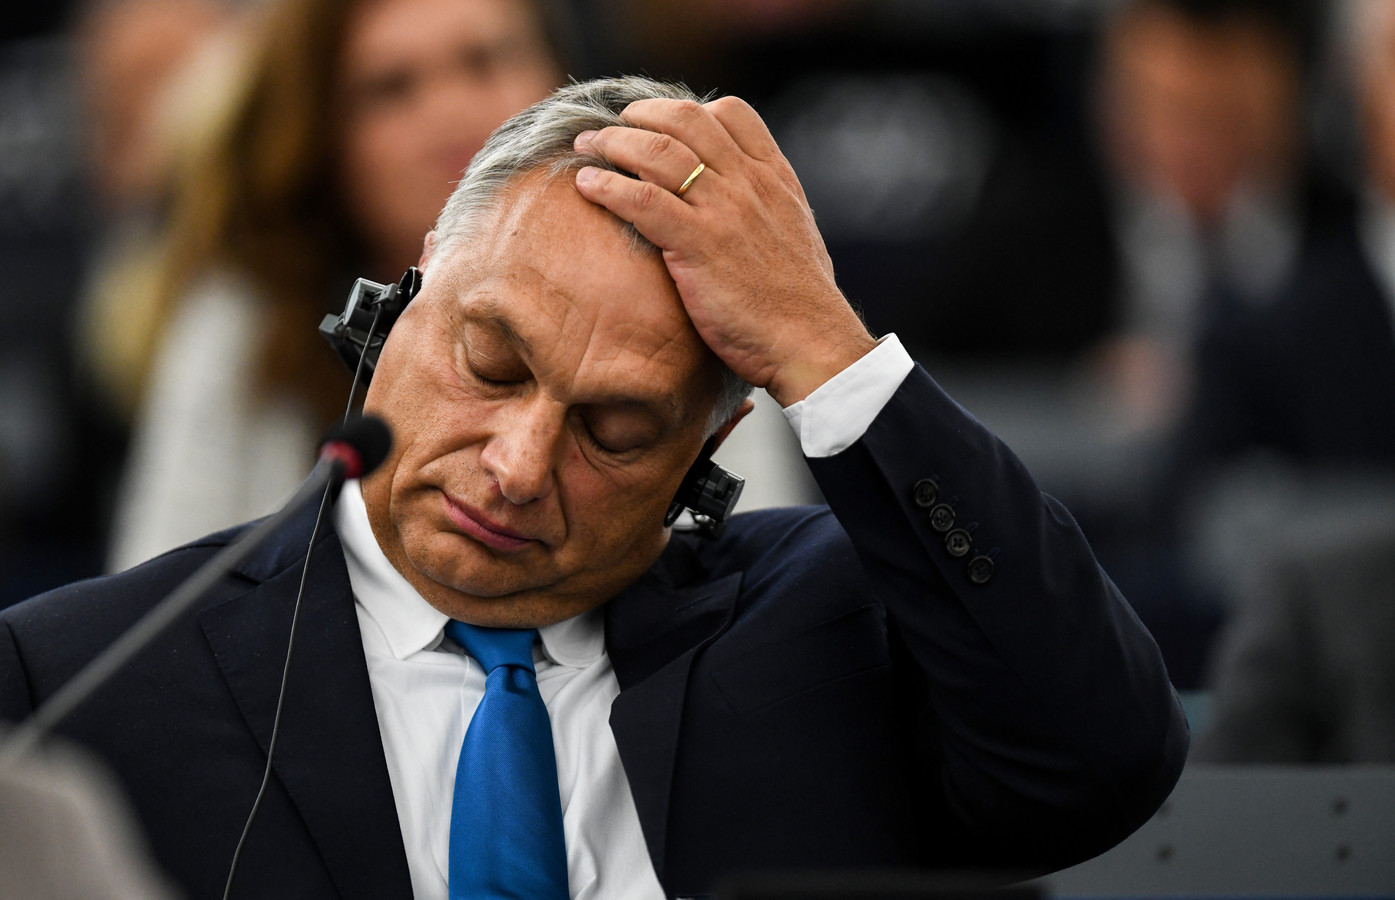 De Hongaarse premier Viktor Orban op archiefbeeld